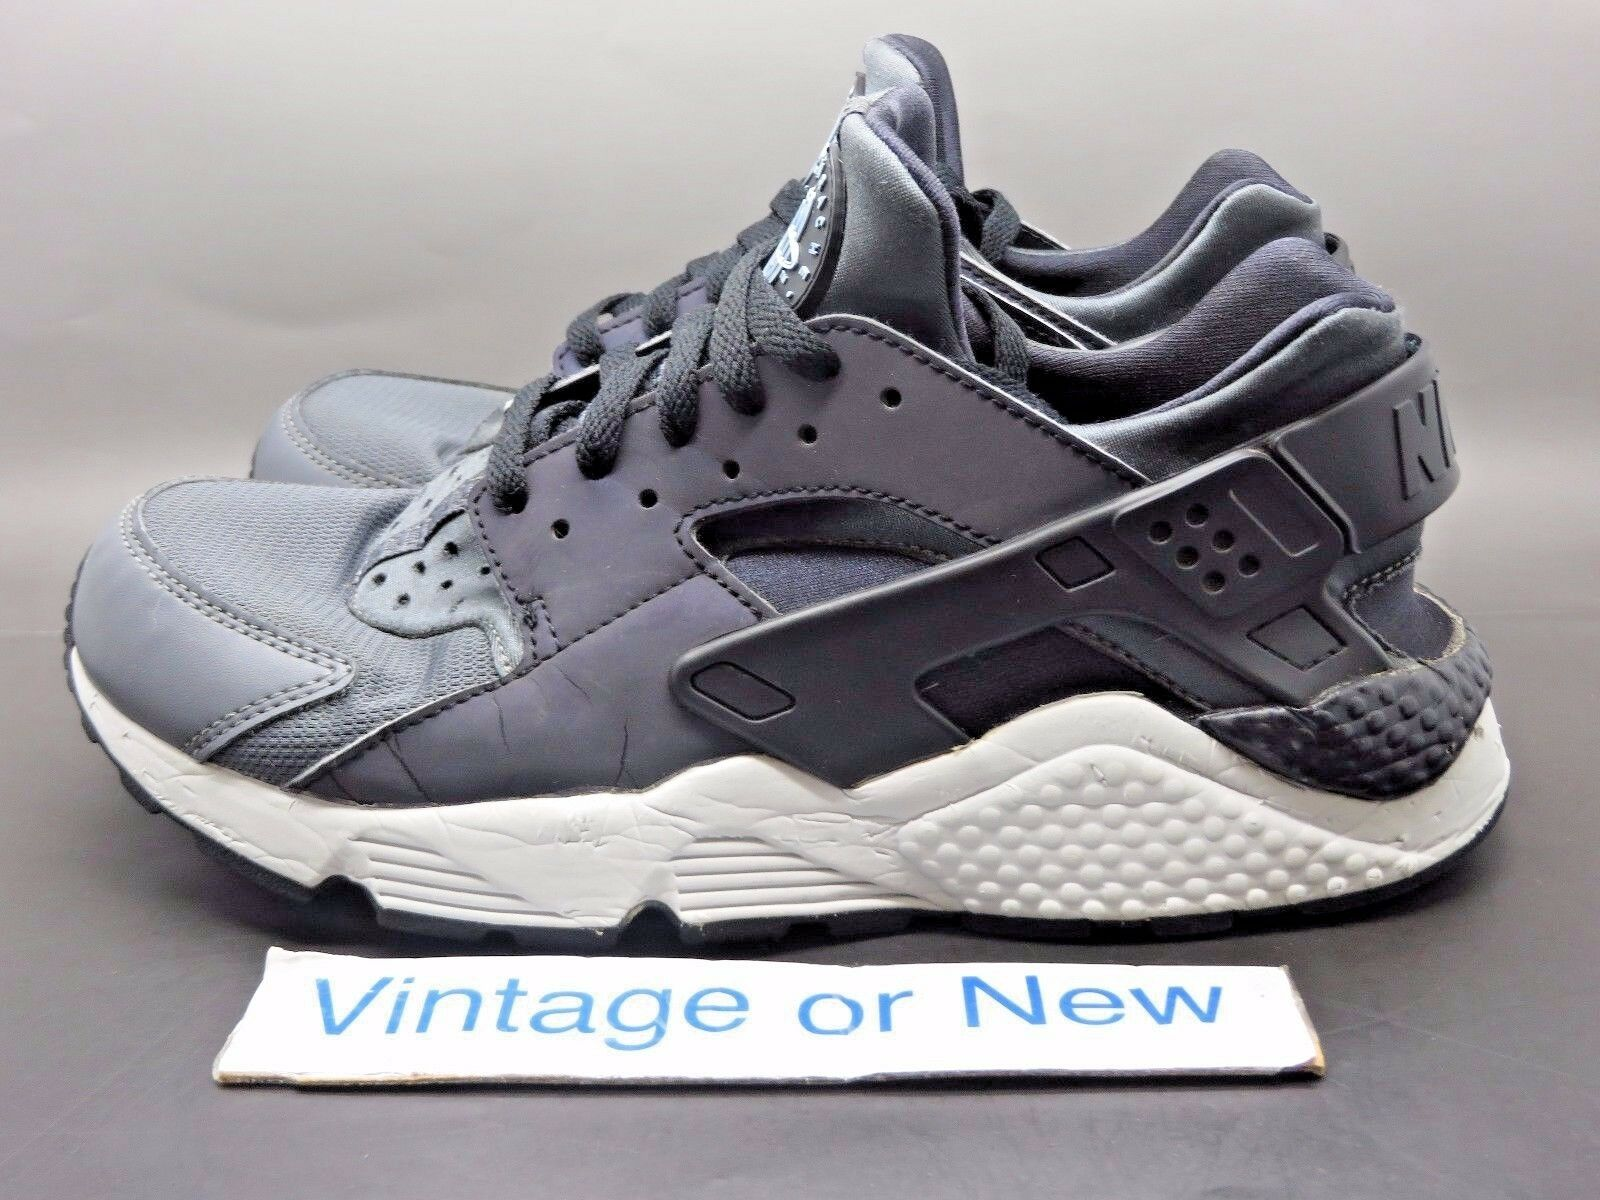 reputable site 49935 a1c68 ... Men s Nike Air Huarache PRM Dark Dark Dark Grey Black Running Shoes sz  8.5 92fcb3 ...